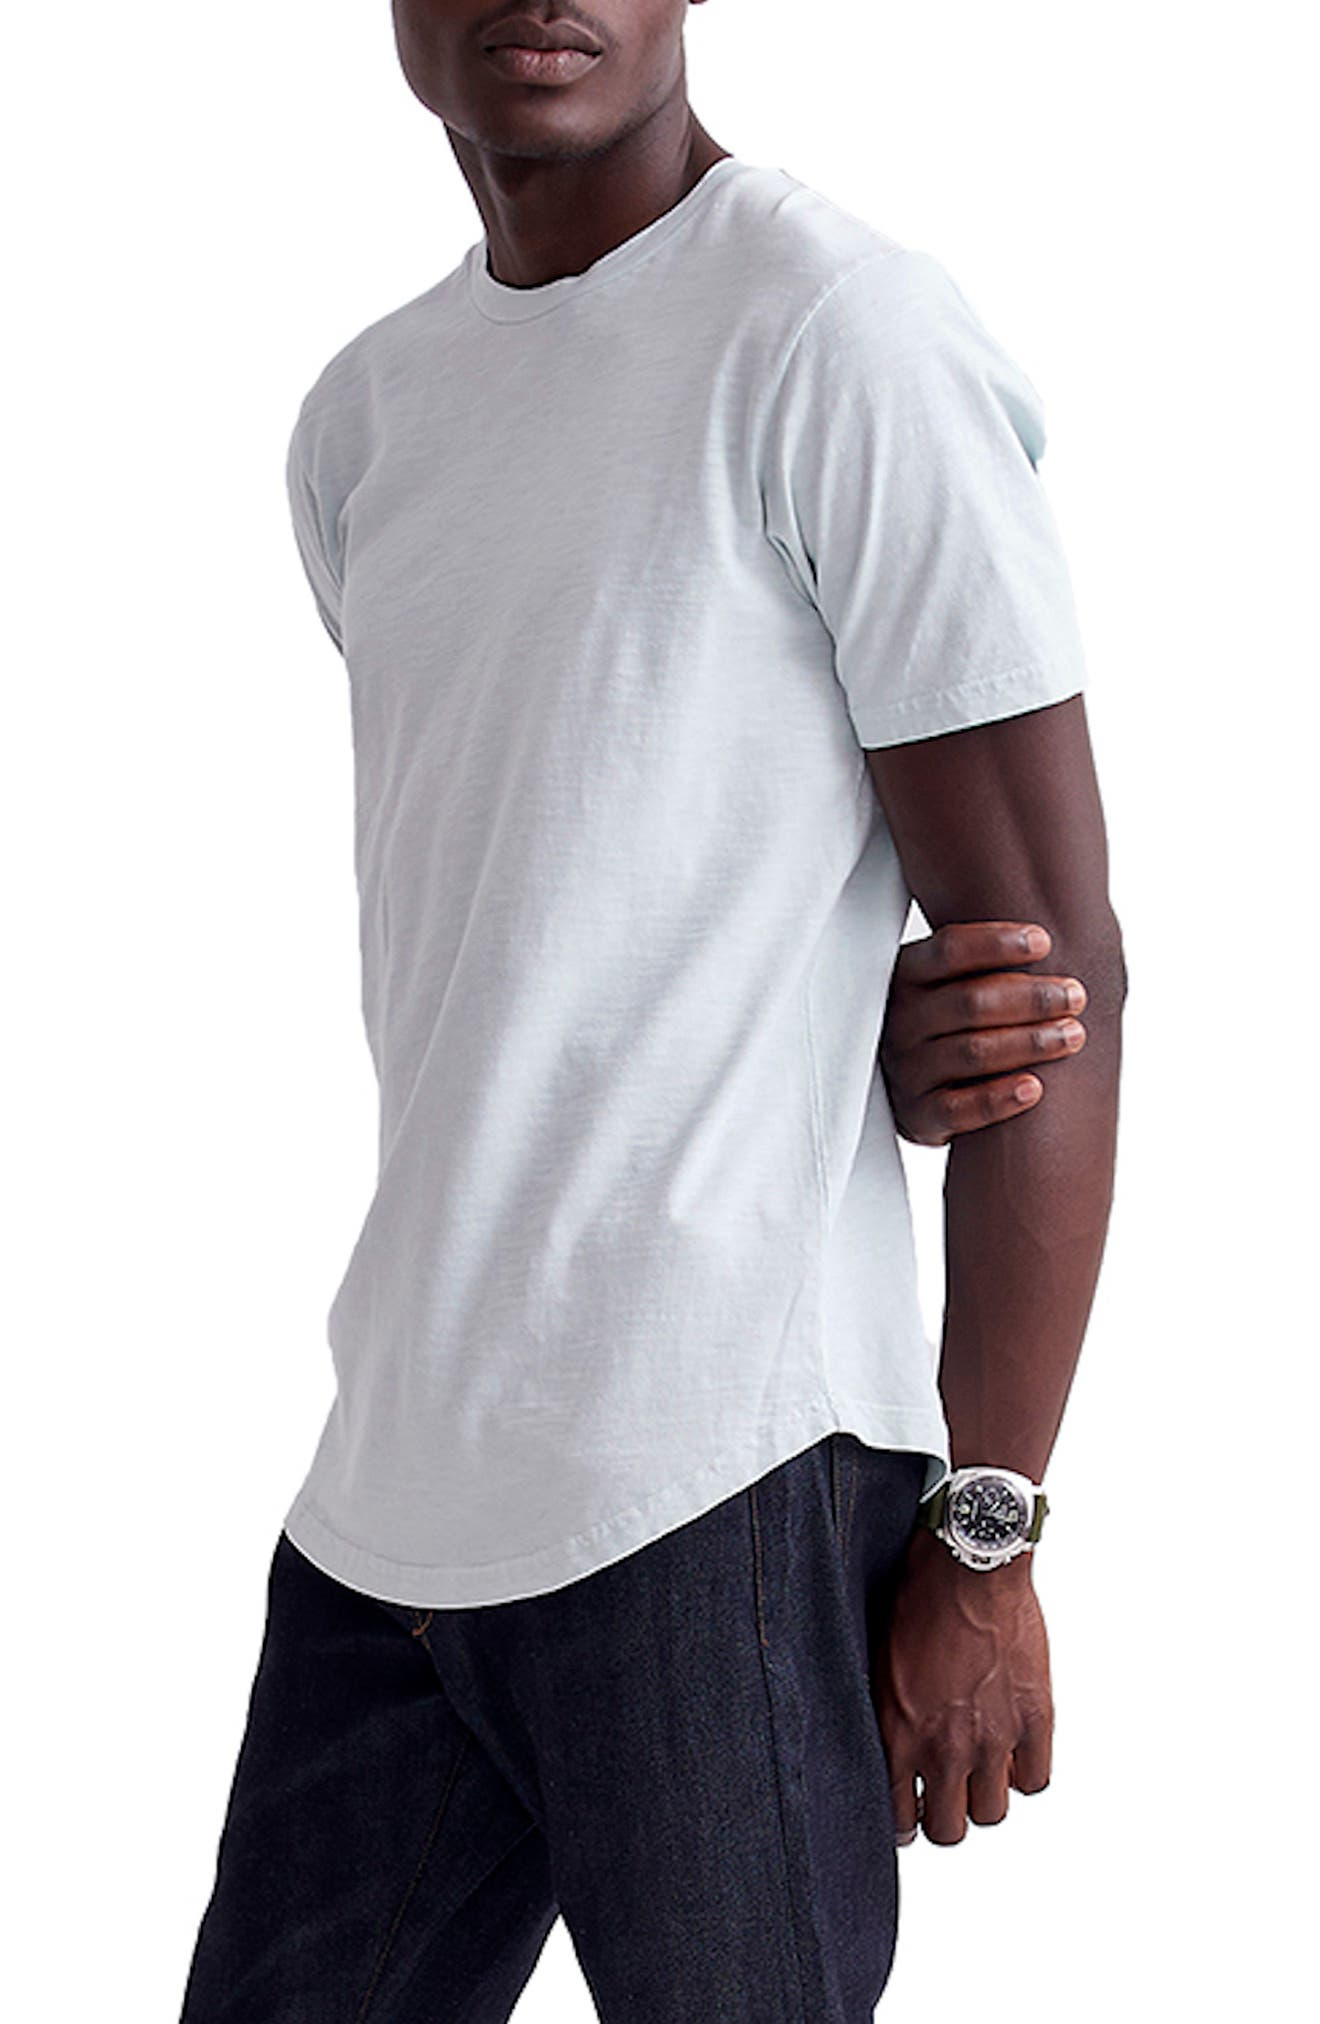 Image of Goodlife Scallop Slub Crew Neck T-Shirt